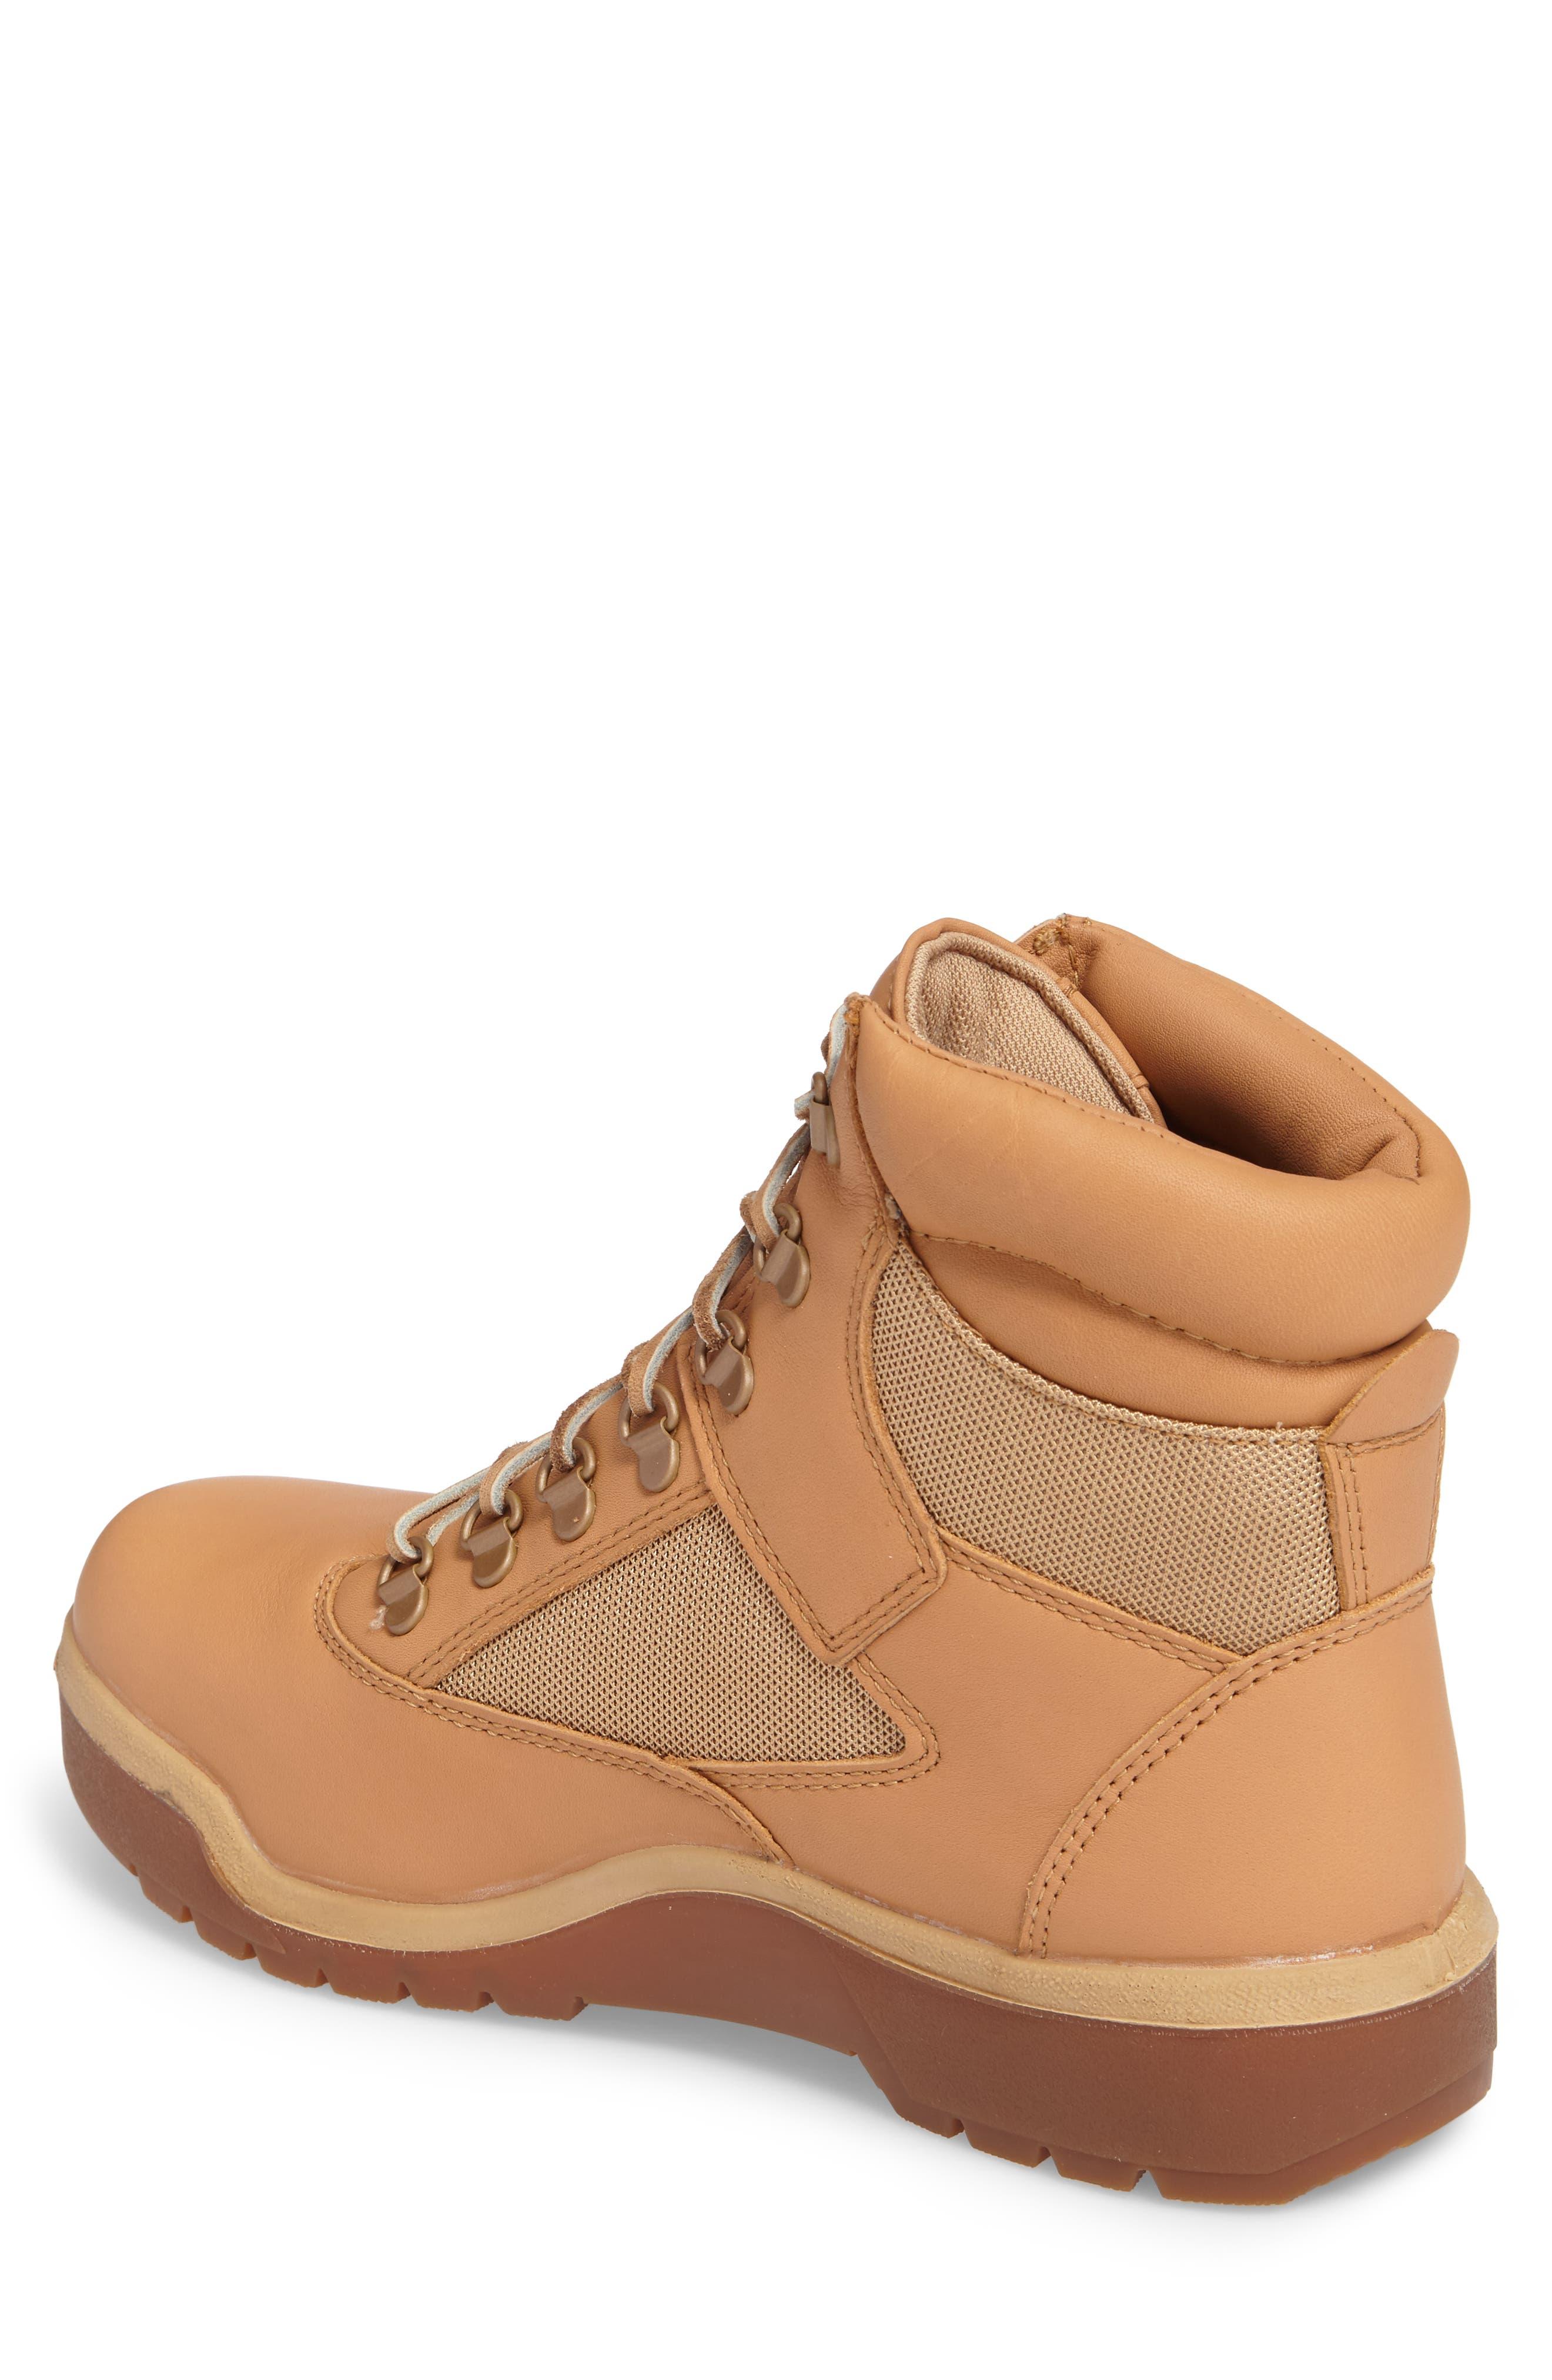 Waterproof Boot,                             Alternate thumbnail 2, color,                             Natural Hoween/ Latigo Leather